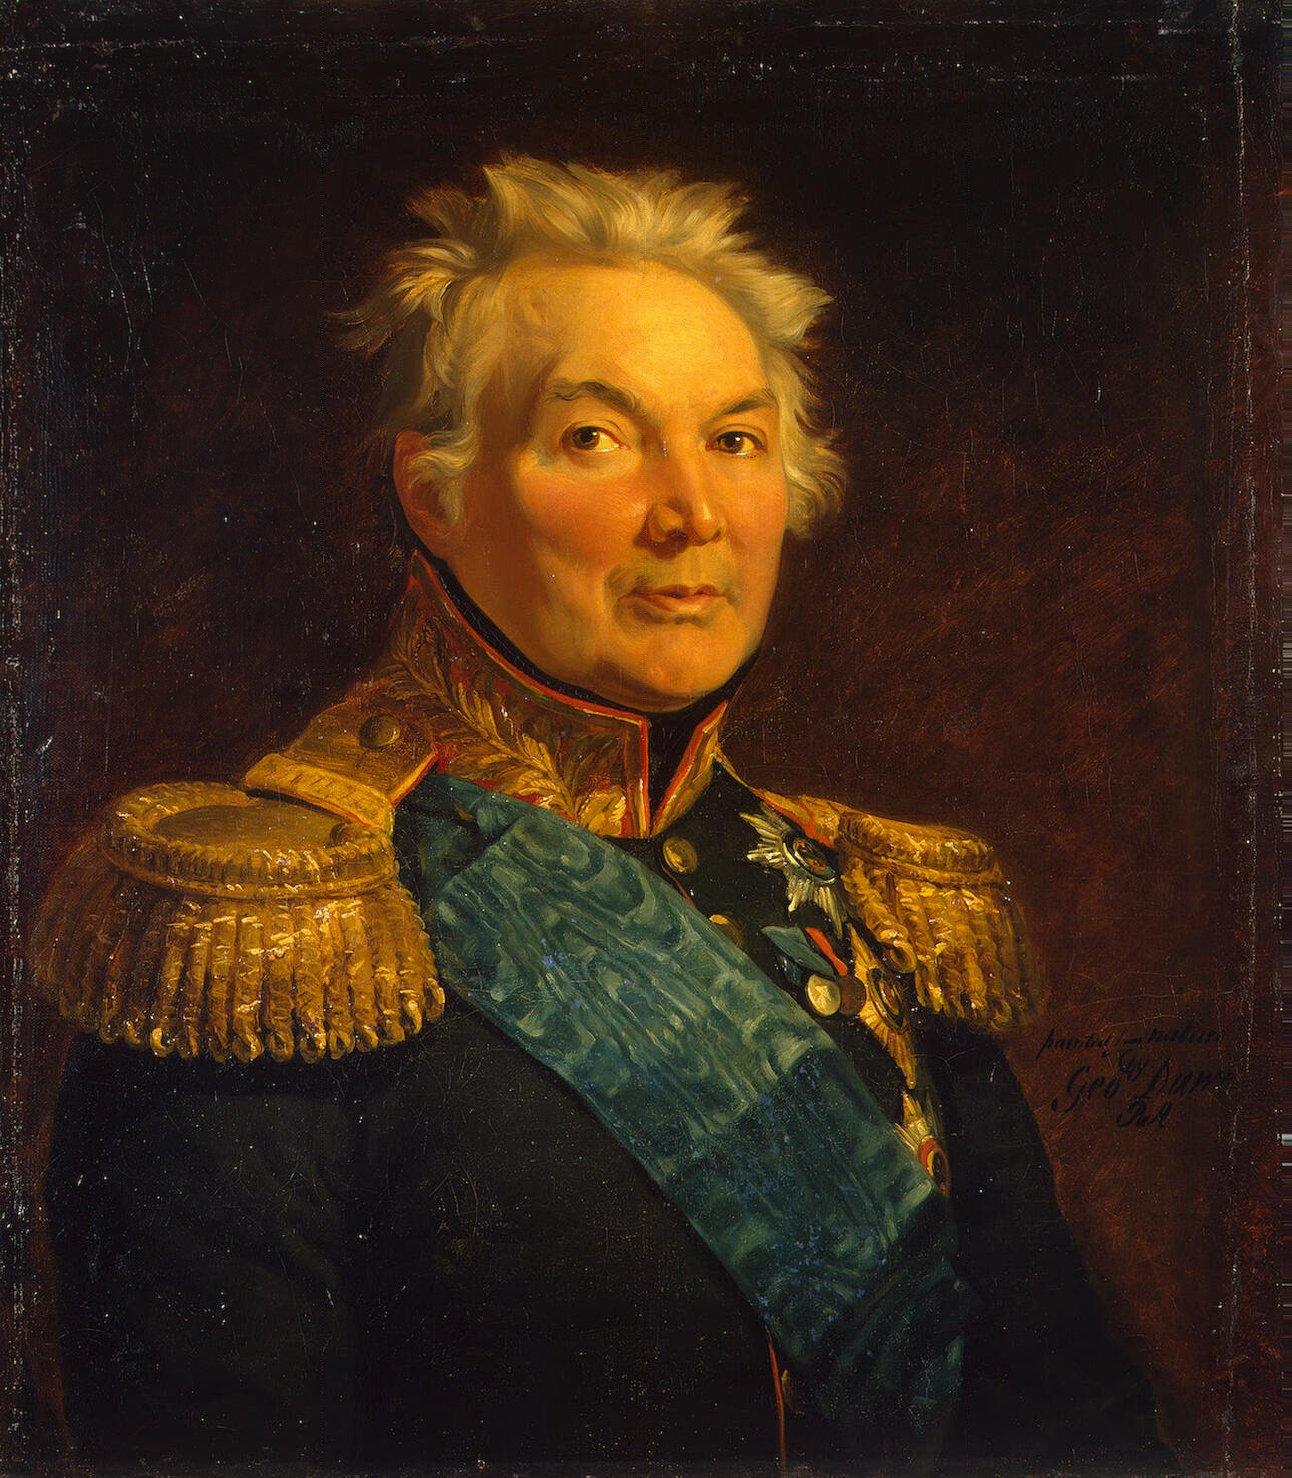 Остен-Сакен, Фабиан Вильгельмович